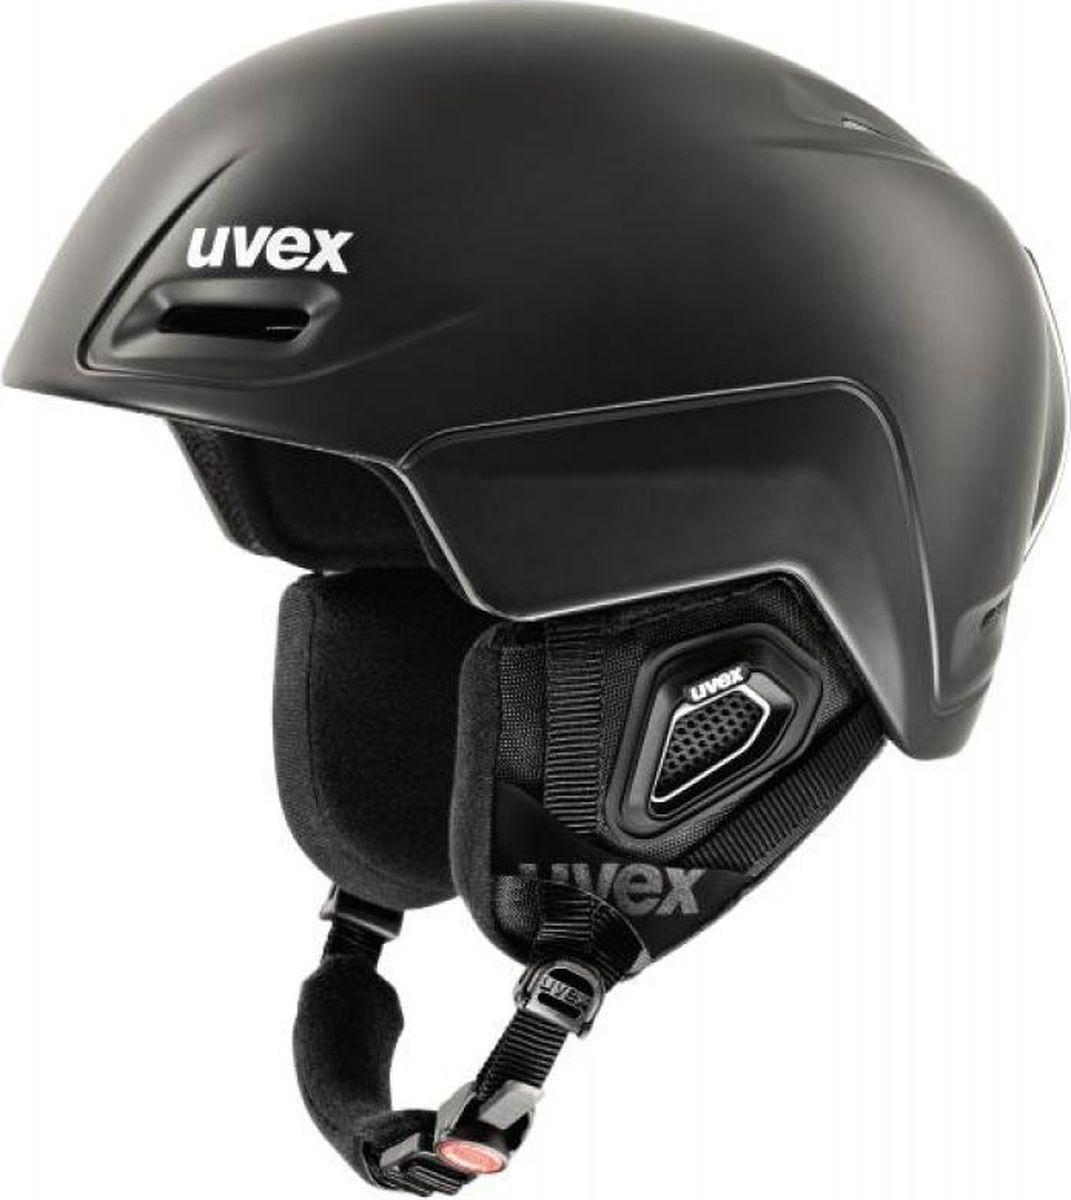 Шлем горнолыжный Uvex Jimm Helmet, цвет: черный матовый. Размер S